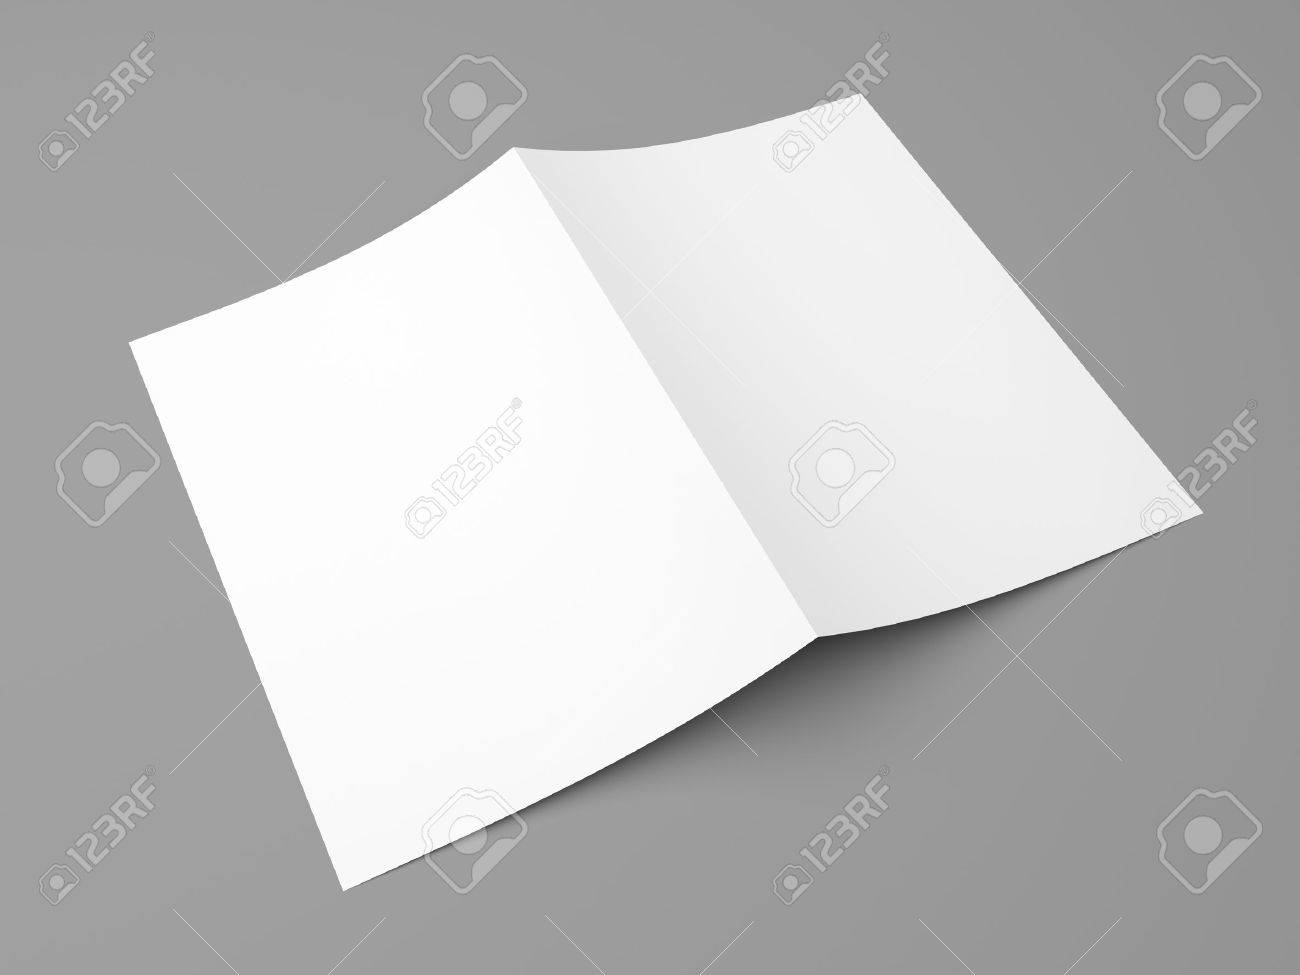 Pli Dpliant Brochure Carte Postale De Visite Ou Une